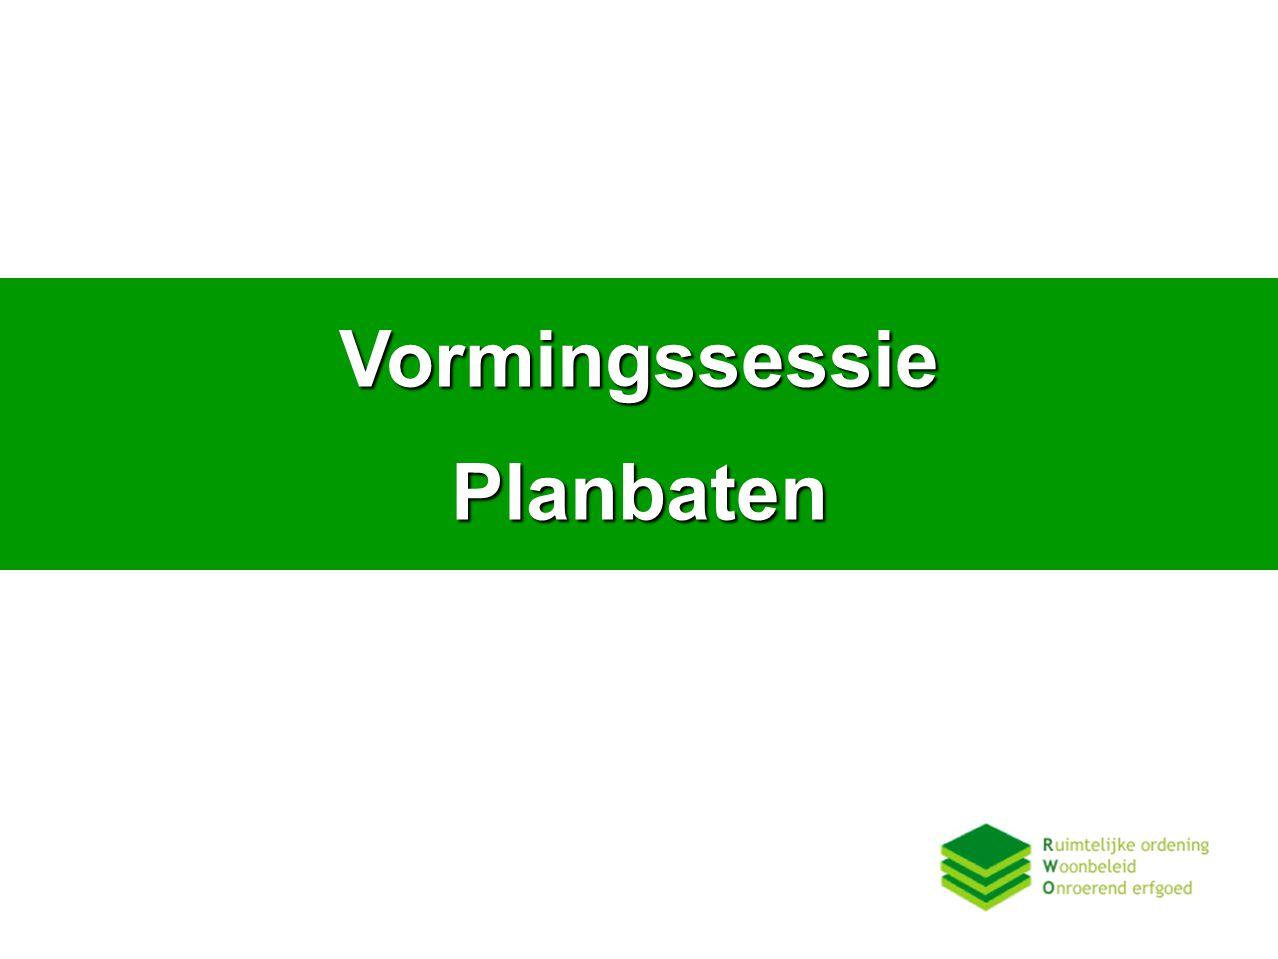 Vormingssessie Planbaten